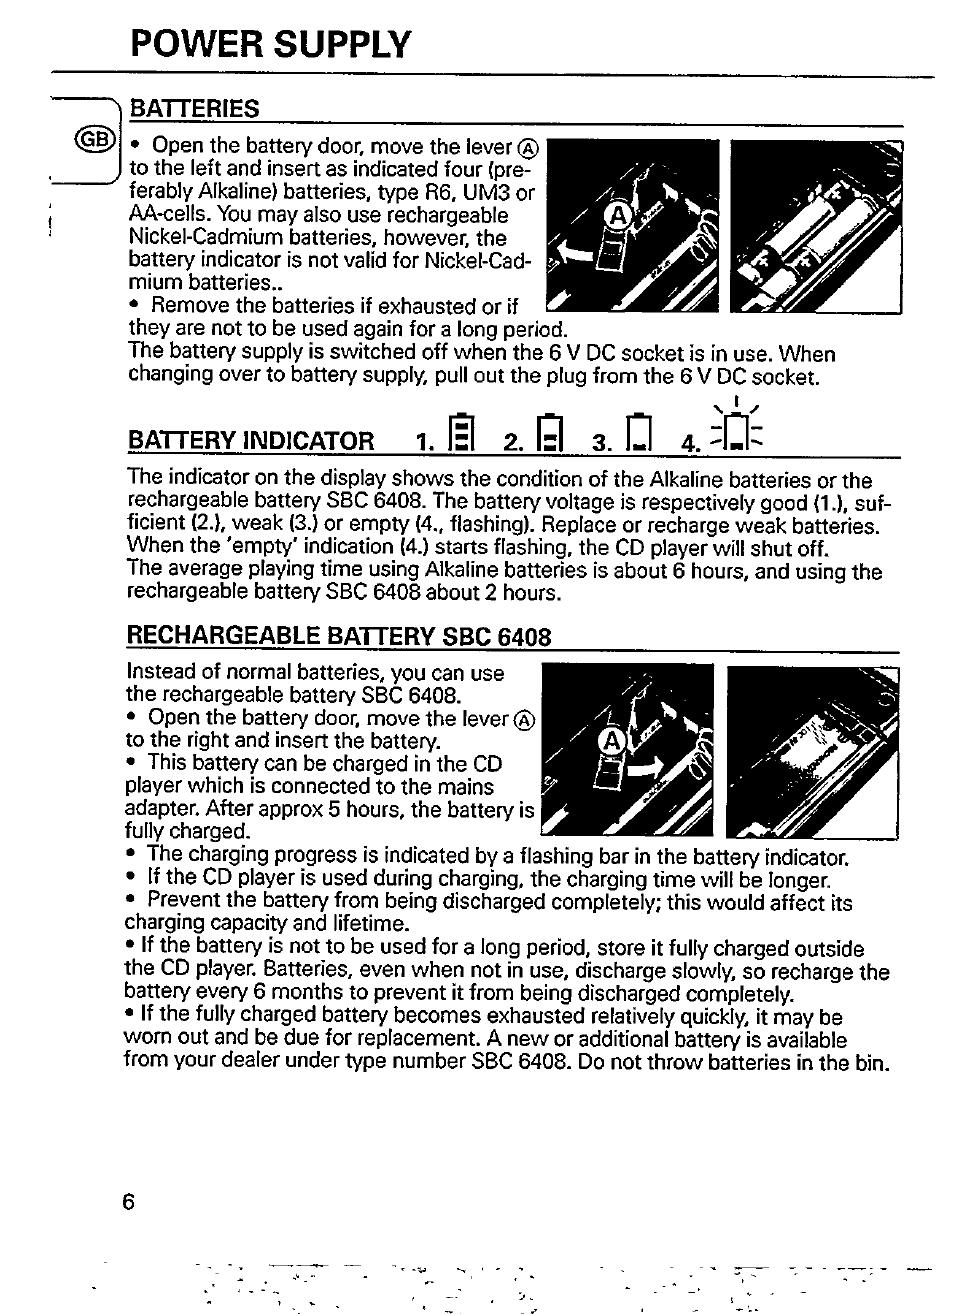 power supply batteries isl 2 19 3 d 4 philips az 6826 user rh manualsdir com Philips Electronics Manuals Philips Universal Remote User Manual